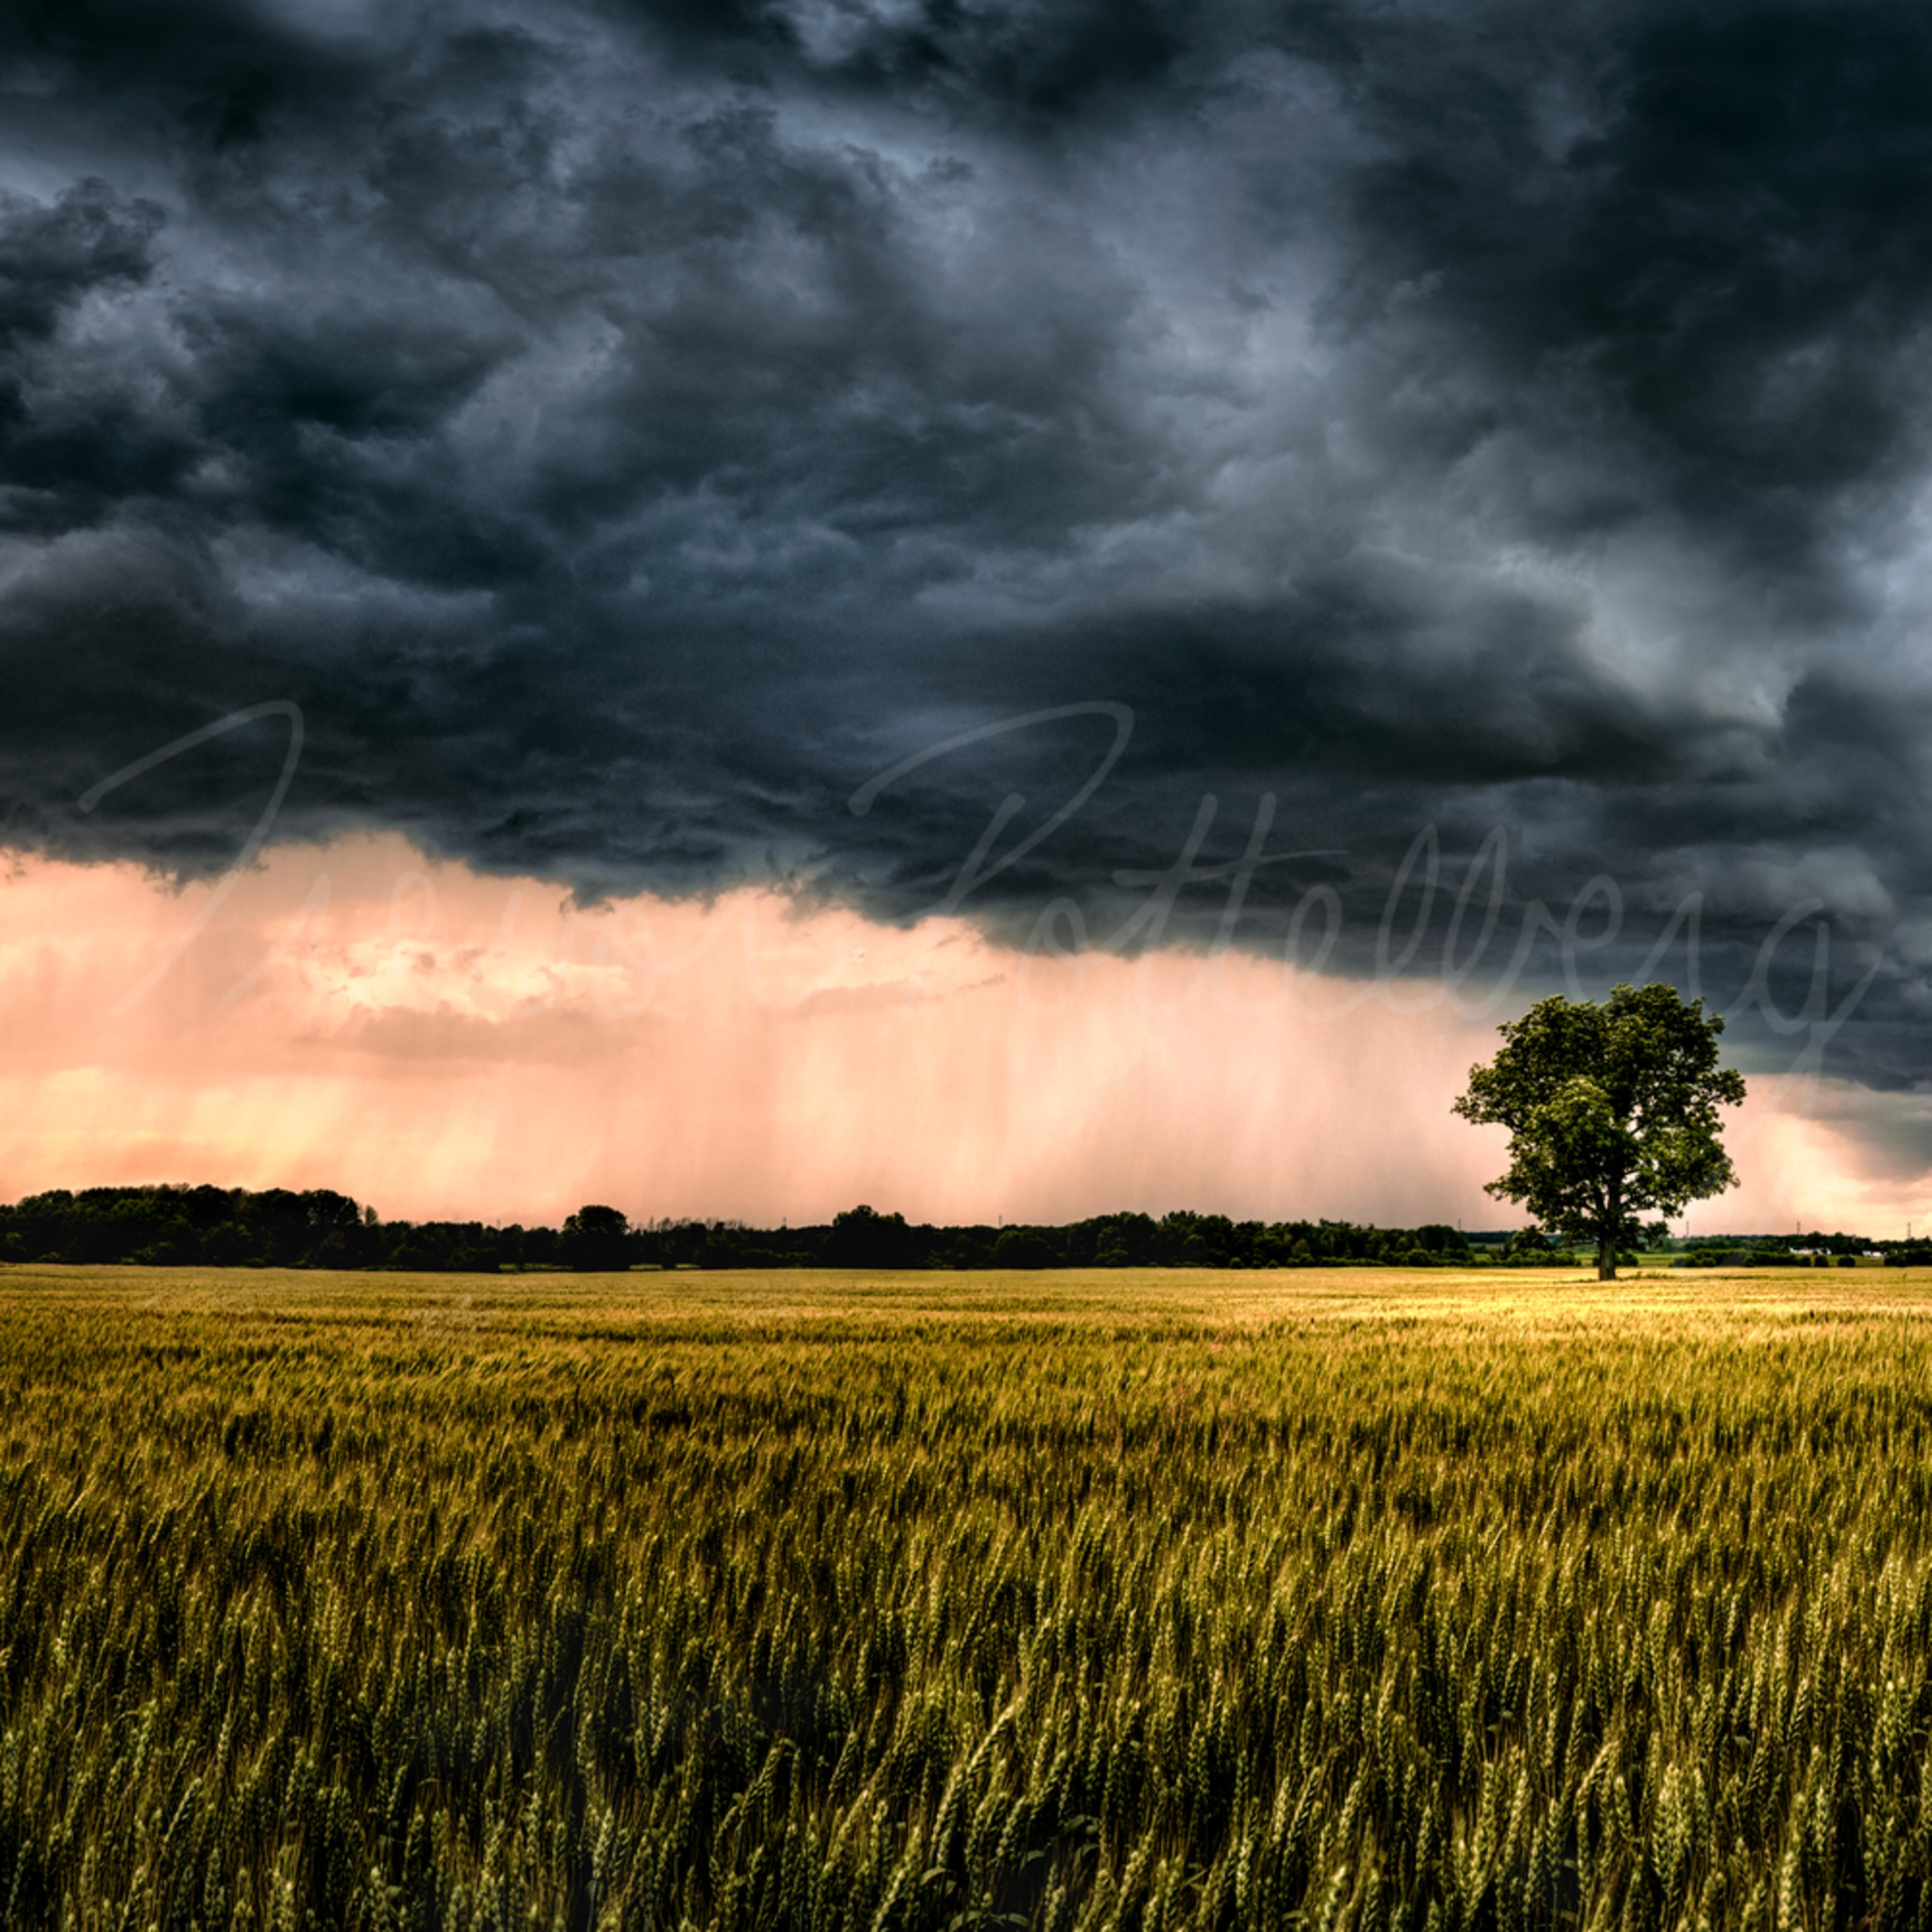 Ominous in nature ihjxtj